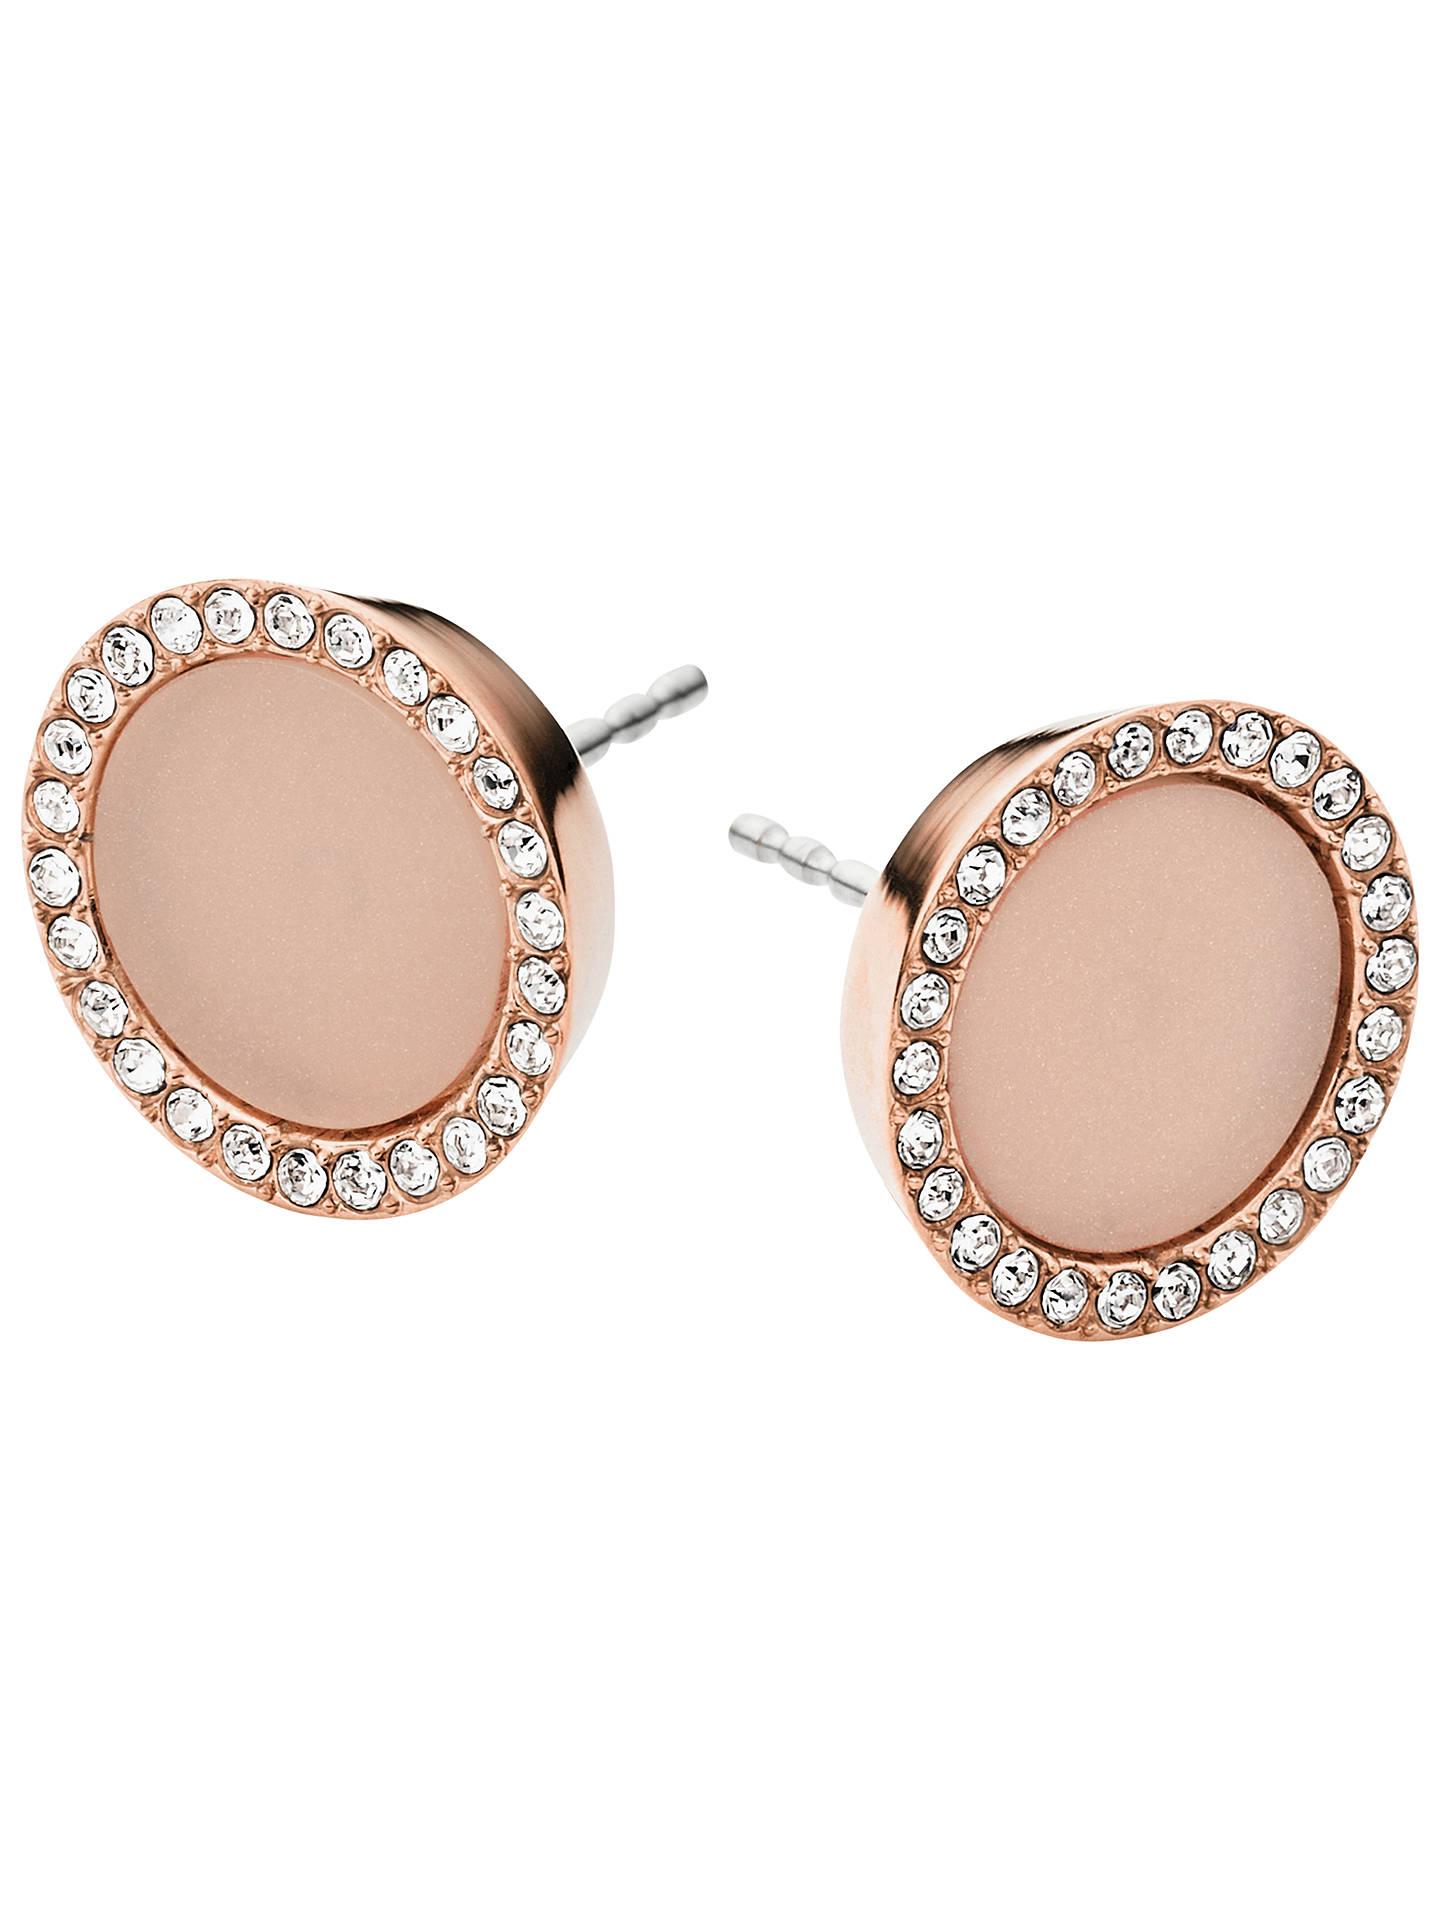 Michael Kors Stud Earrings Rose Gold Online At Johnlewis